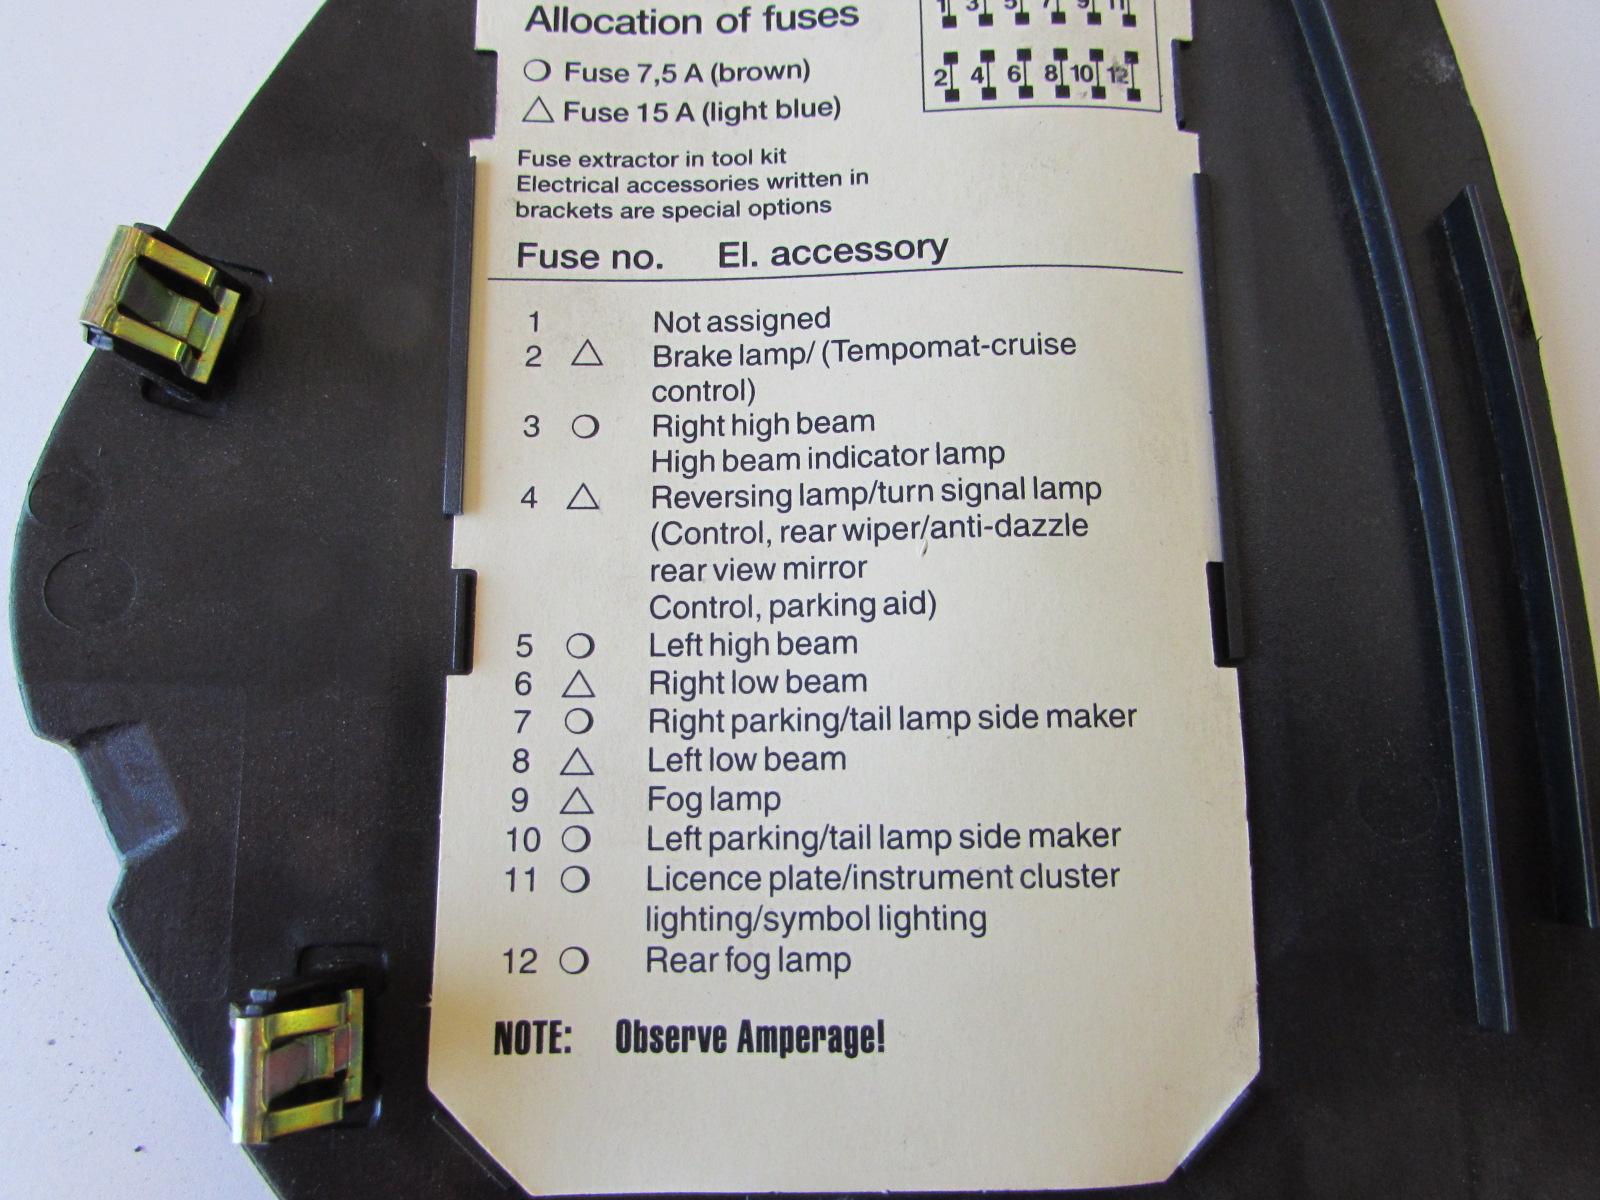 2000 vw fuse box diagram danfoss hsa3 wiring mercedes dash cover, left 2086800178 w208 clk320 clk430 clk55 amg - hermes auto parts